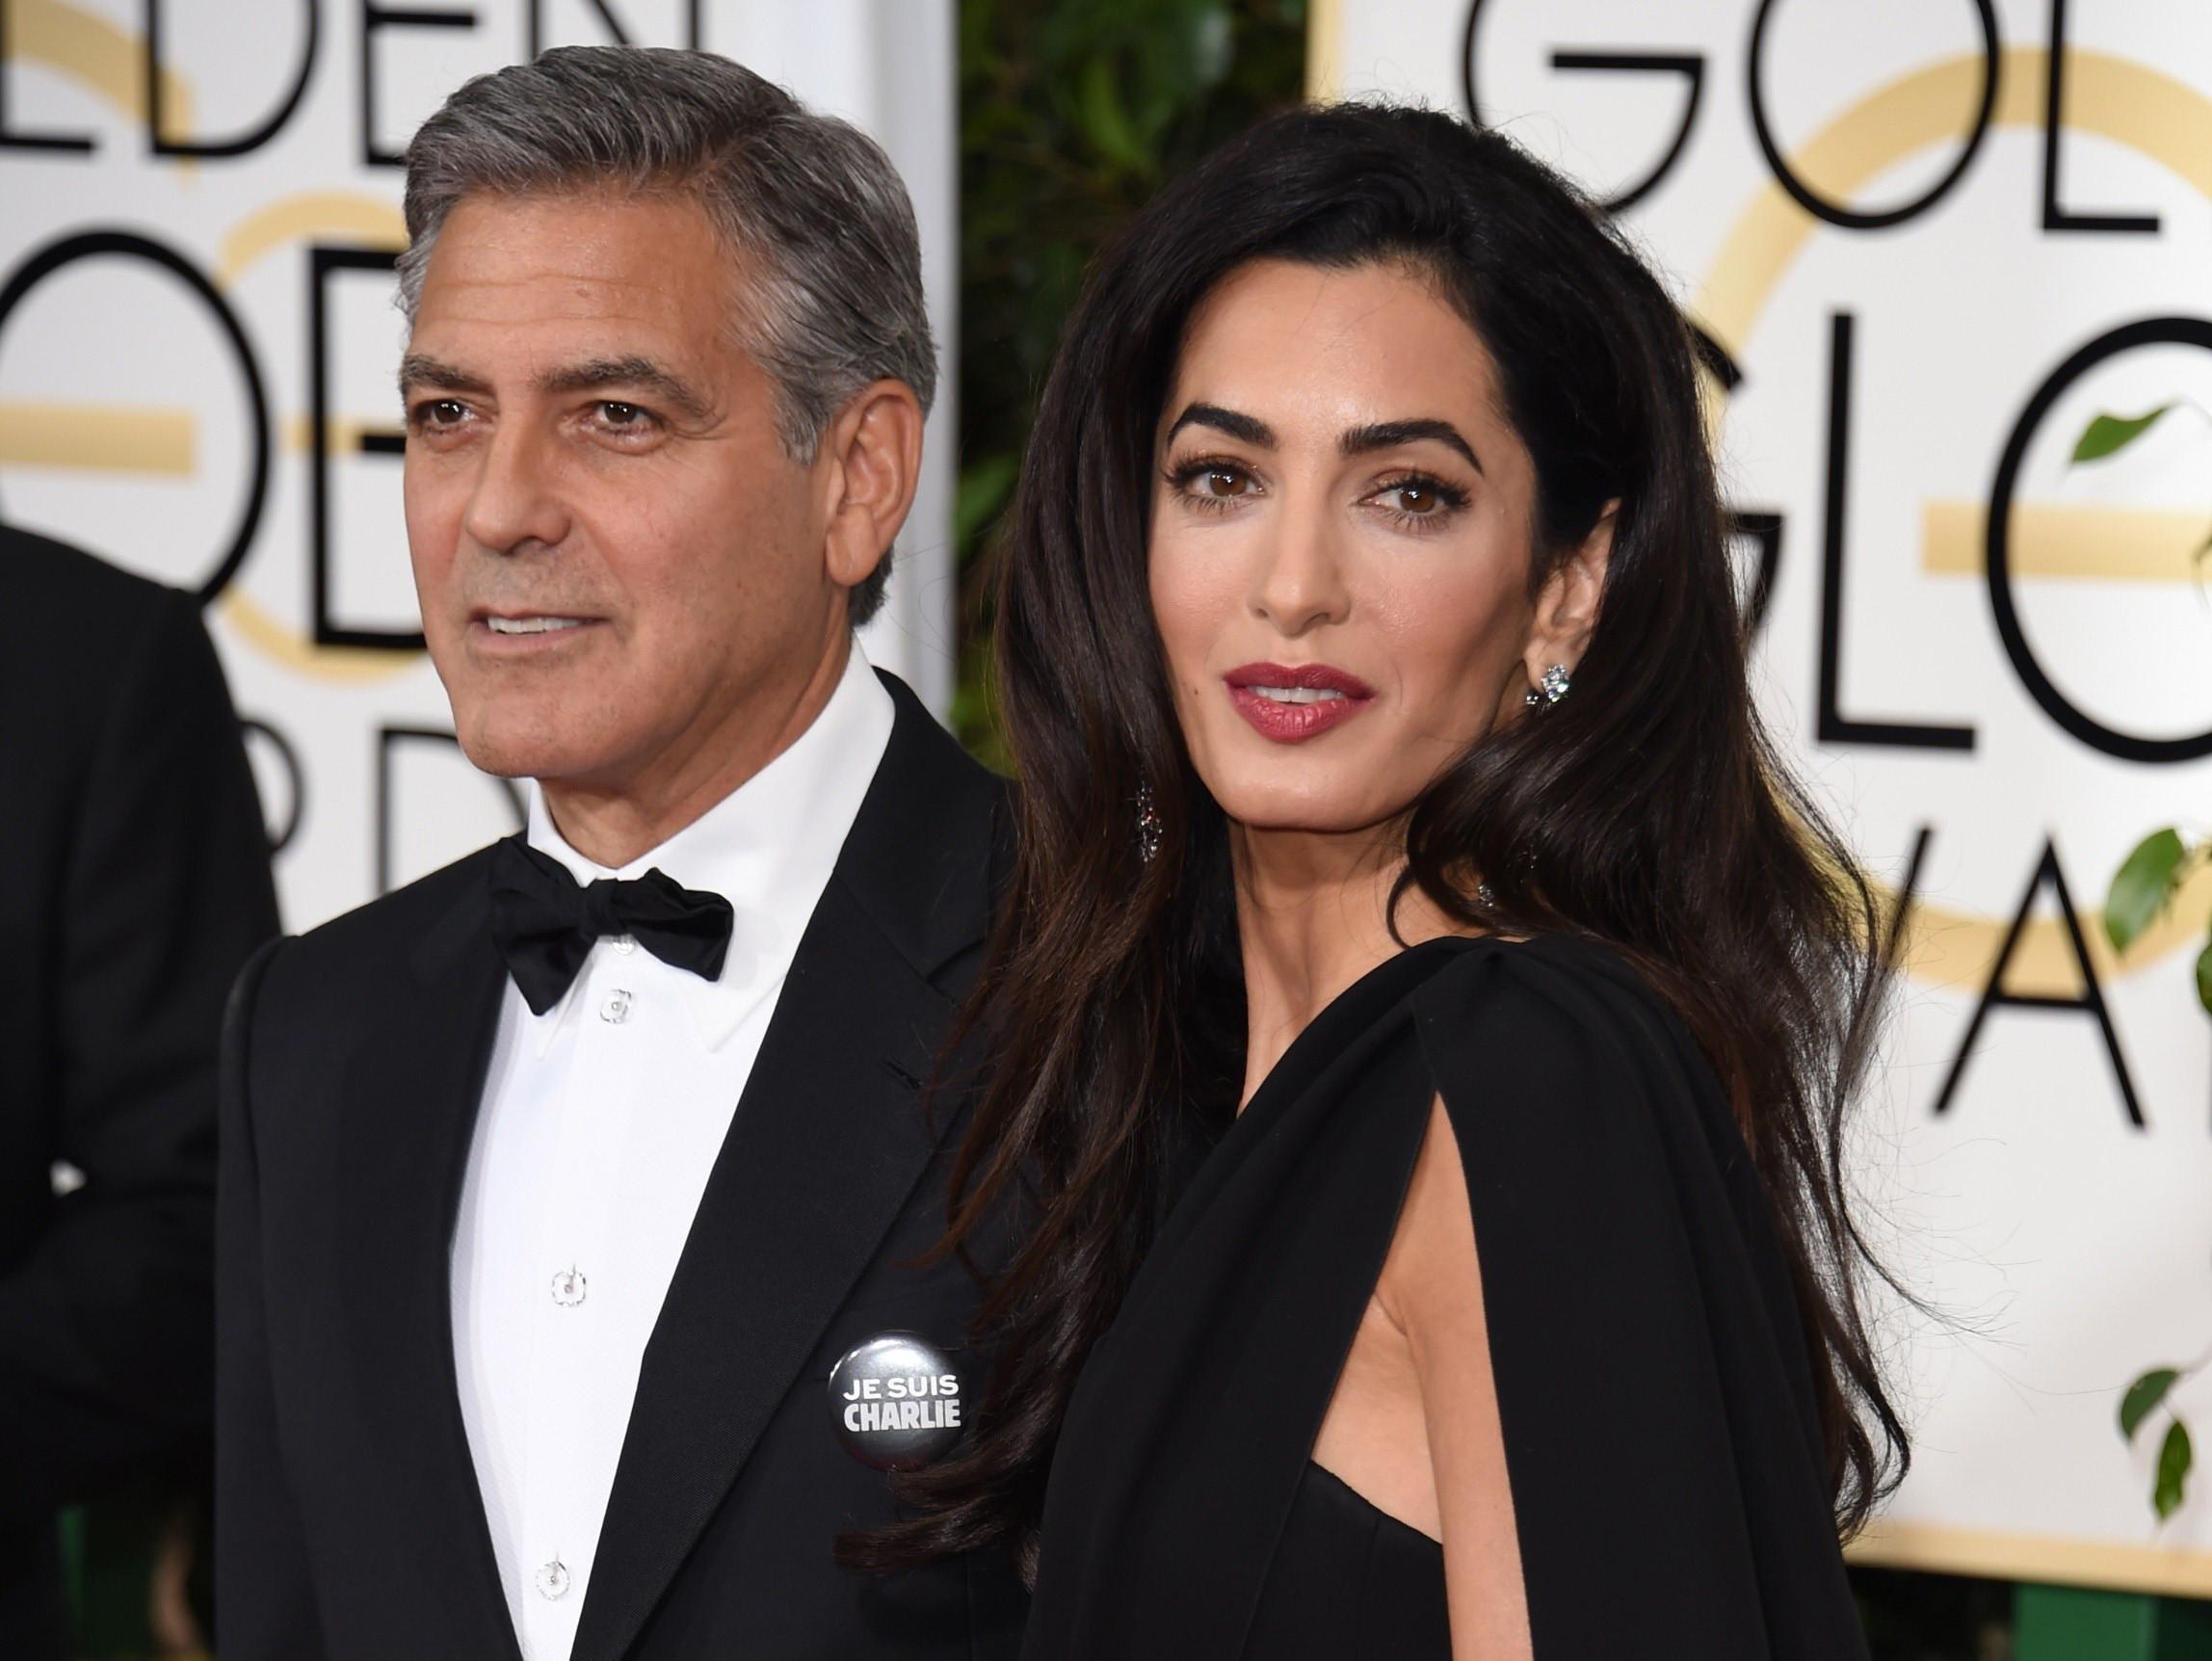 Муж Синди Кроуфорд поведал накого похожи дети Джорджа Клуни